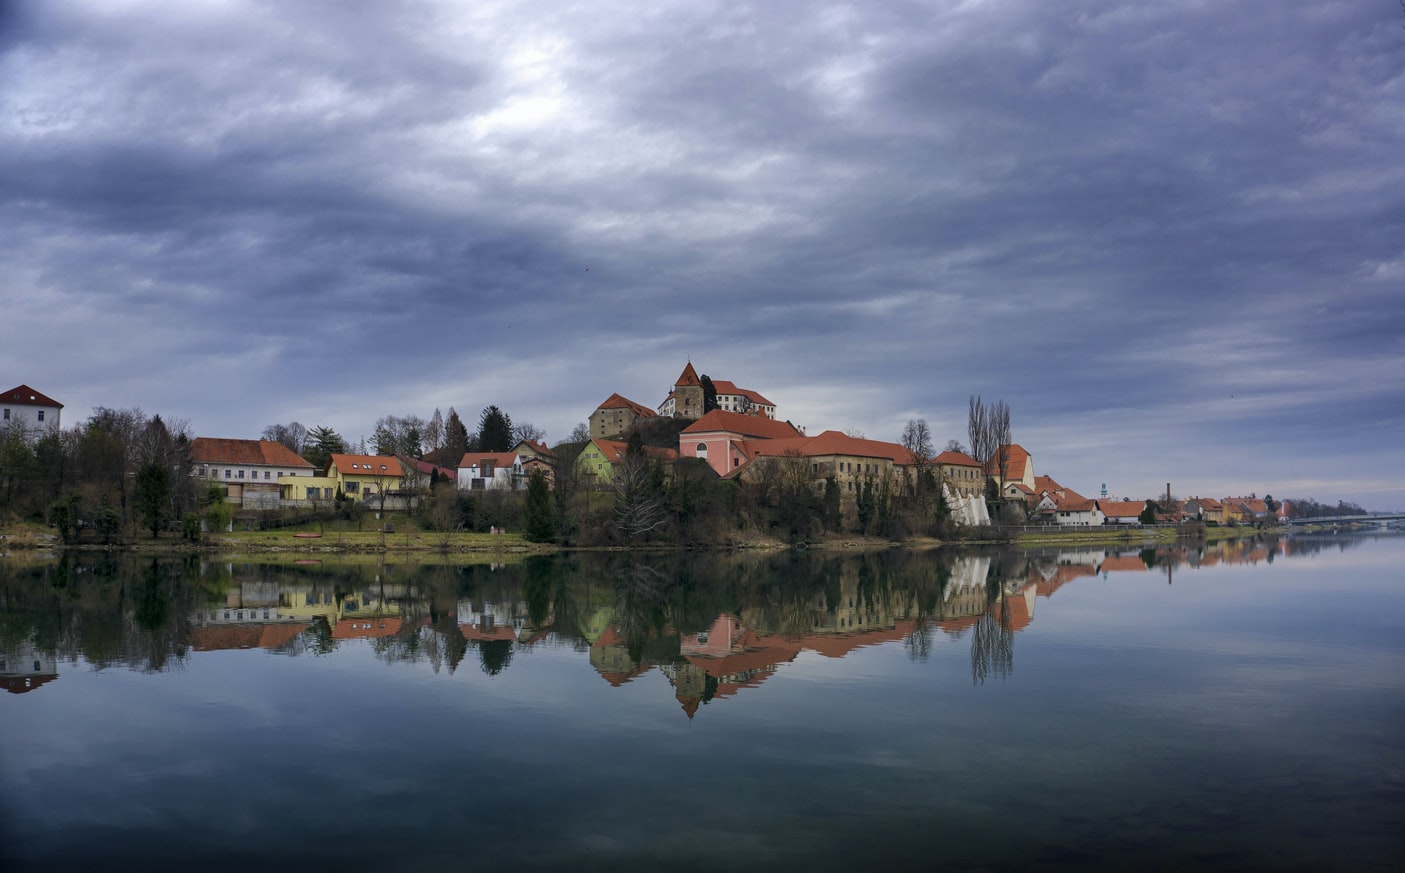 Auslandspraktikum in Slowenien - Ptuj